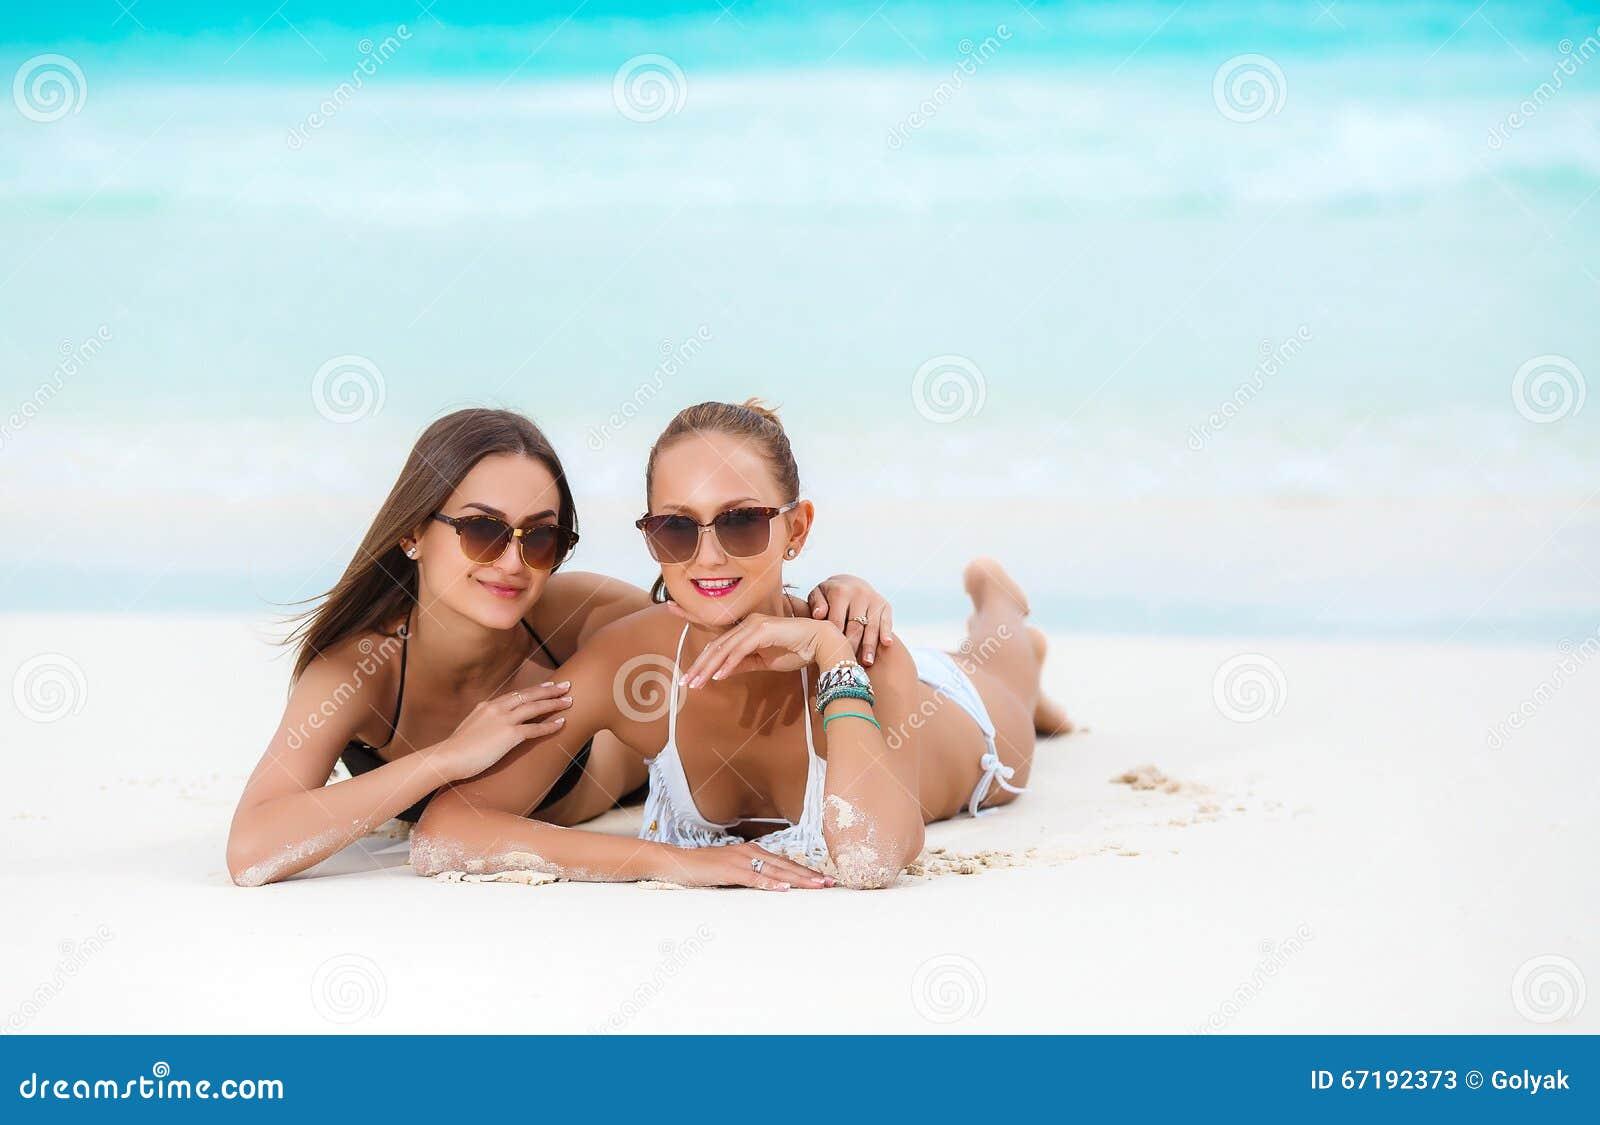 Pintura bikini playa chica